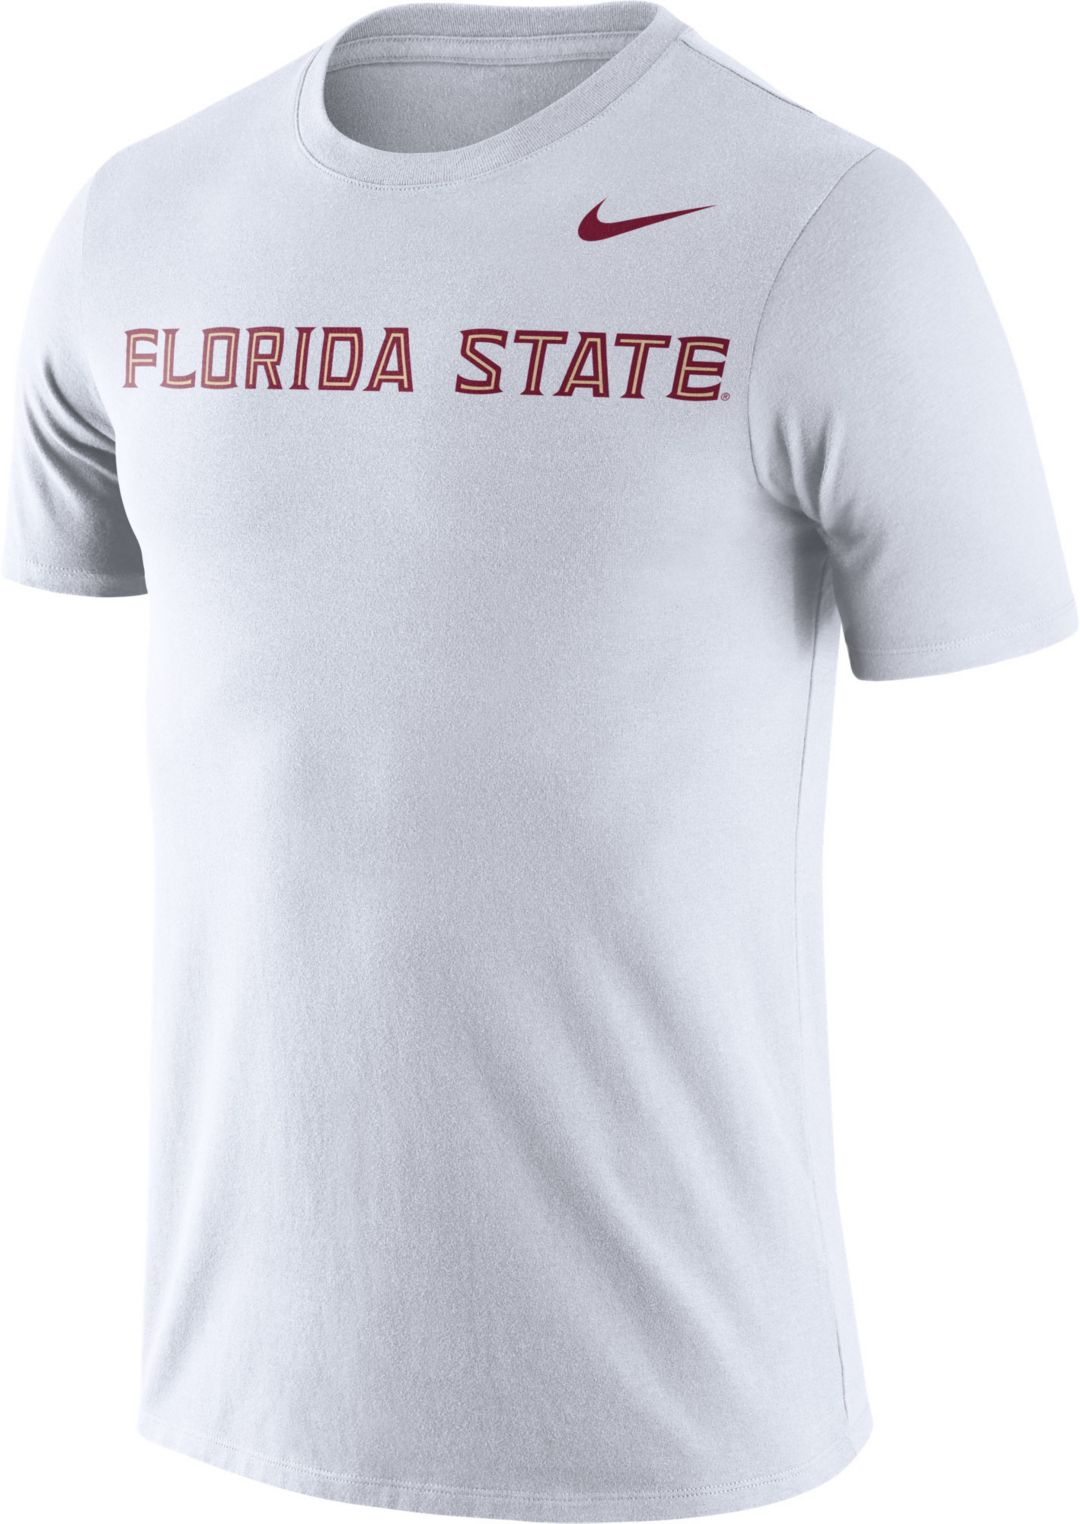 new styles ab70f 90e42 Nike Men's Florida State Seminoles Dri-FIT Cotton Word White T-Shirt